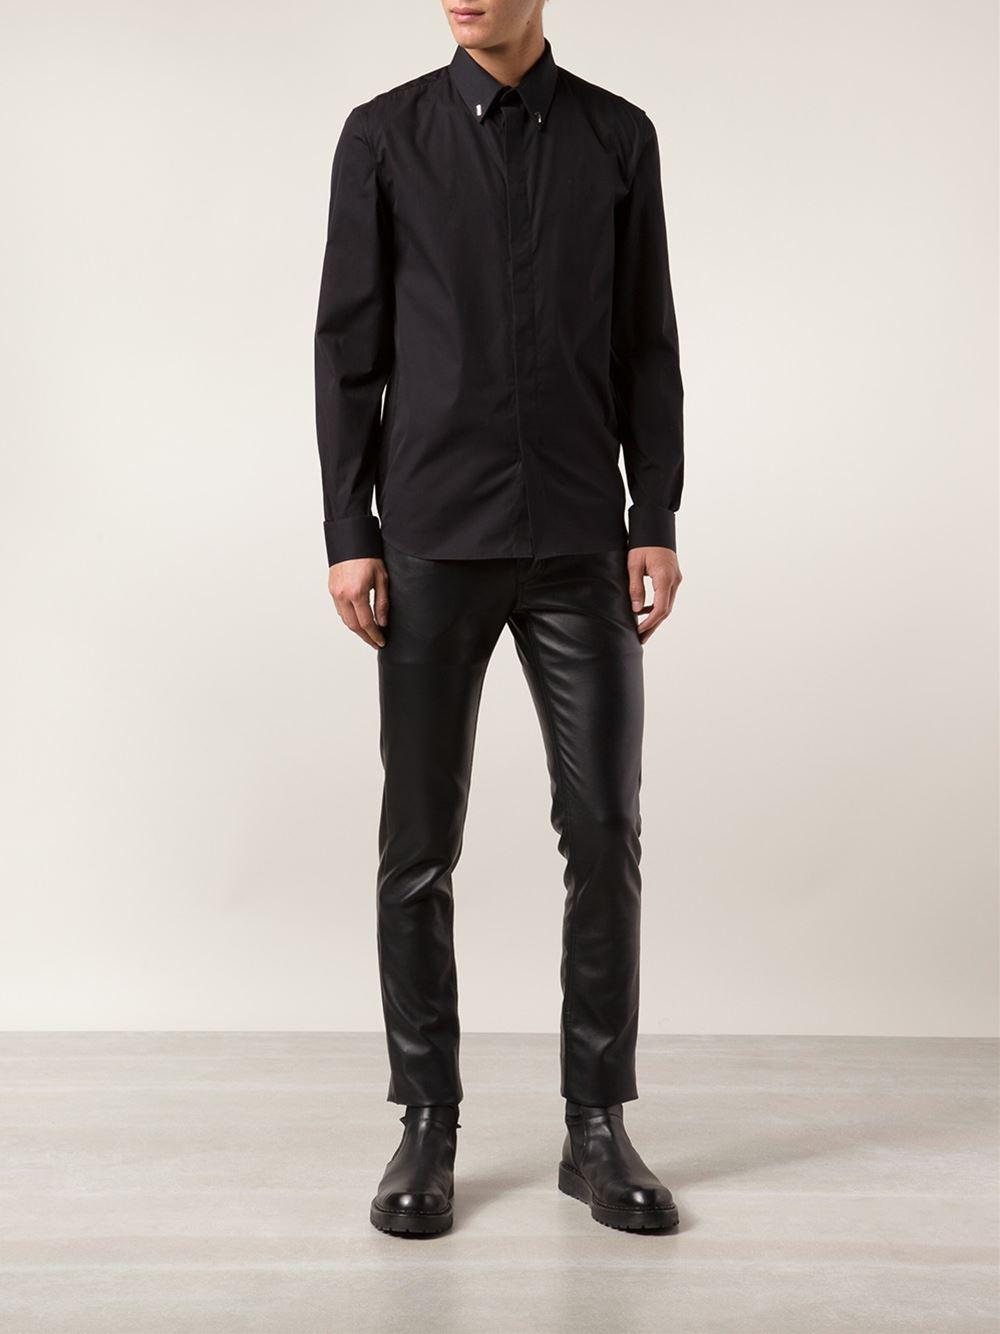 givenchy 39 17 39 classic shirt in black for men lyst. Black Bedroom Furniture Sets. Home Design Ideas